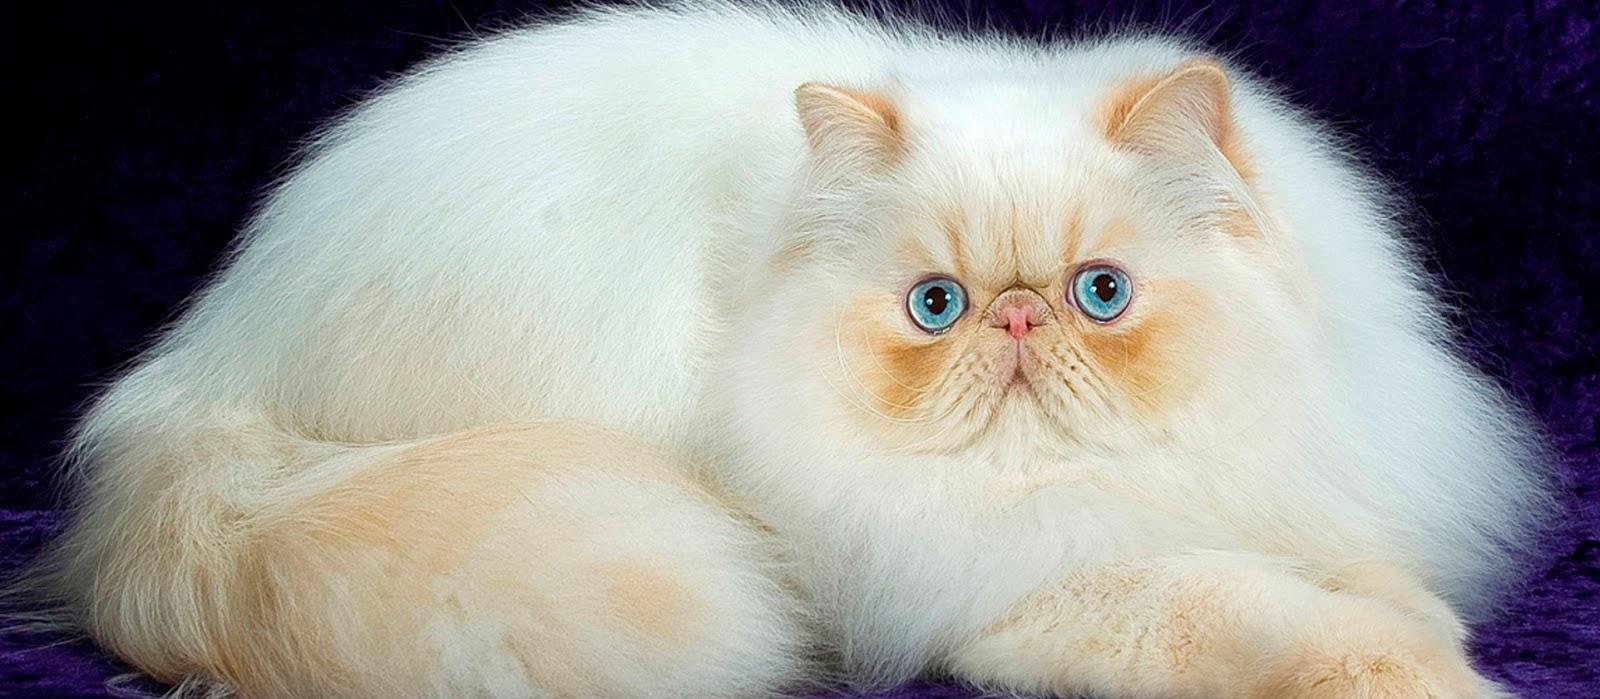 Harga Kucing Persia Dan Kucing Anggora 2018 Terbaru